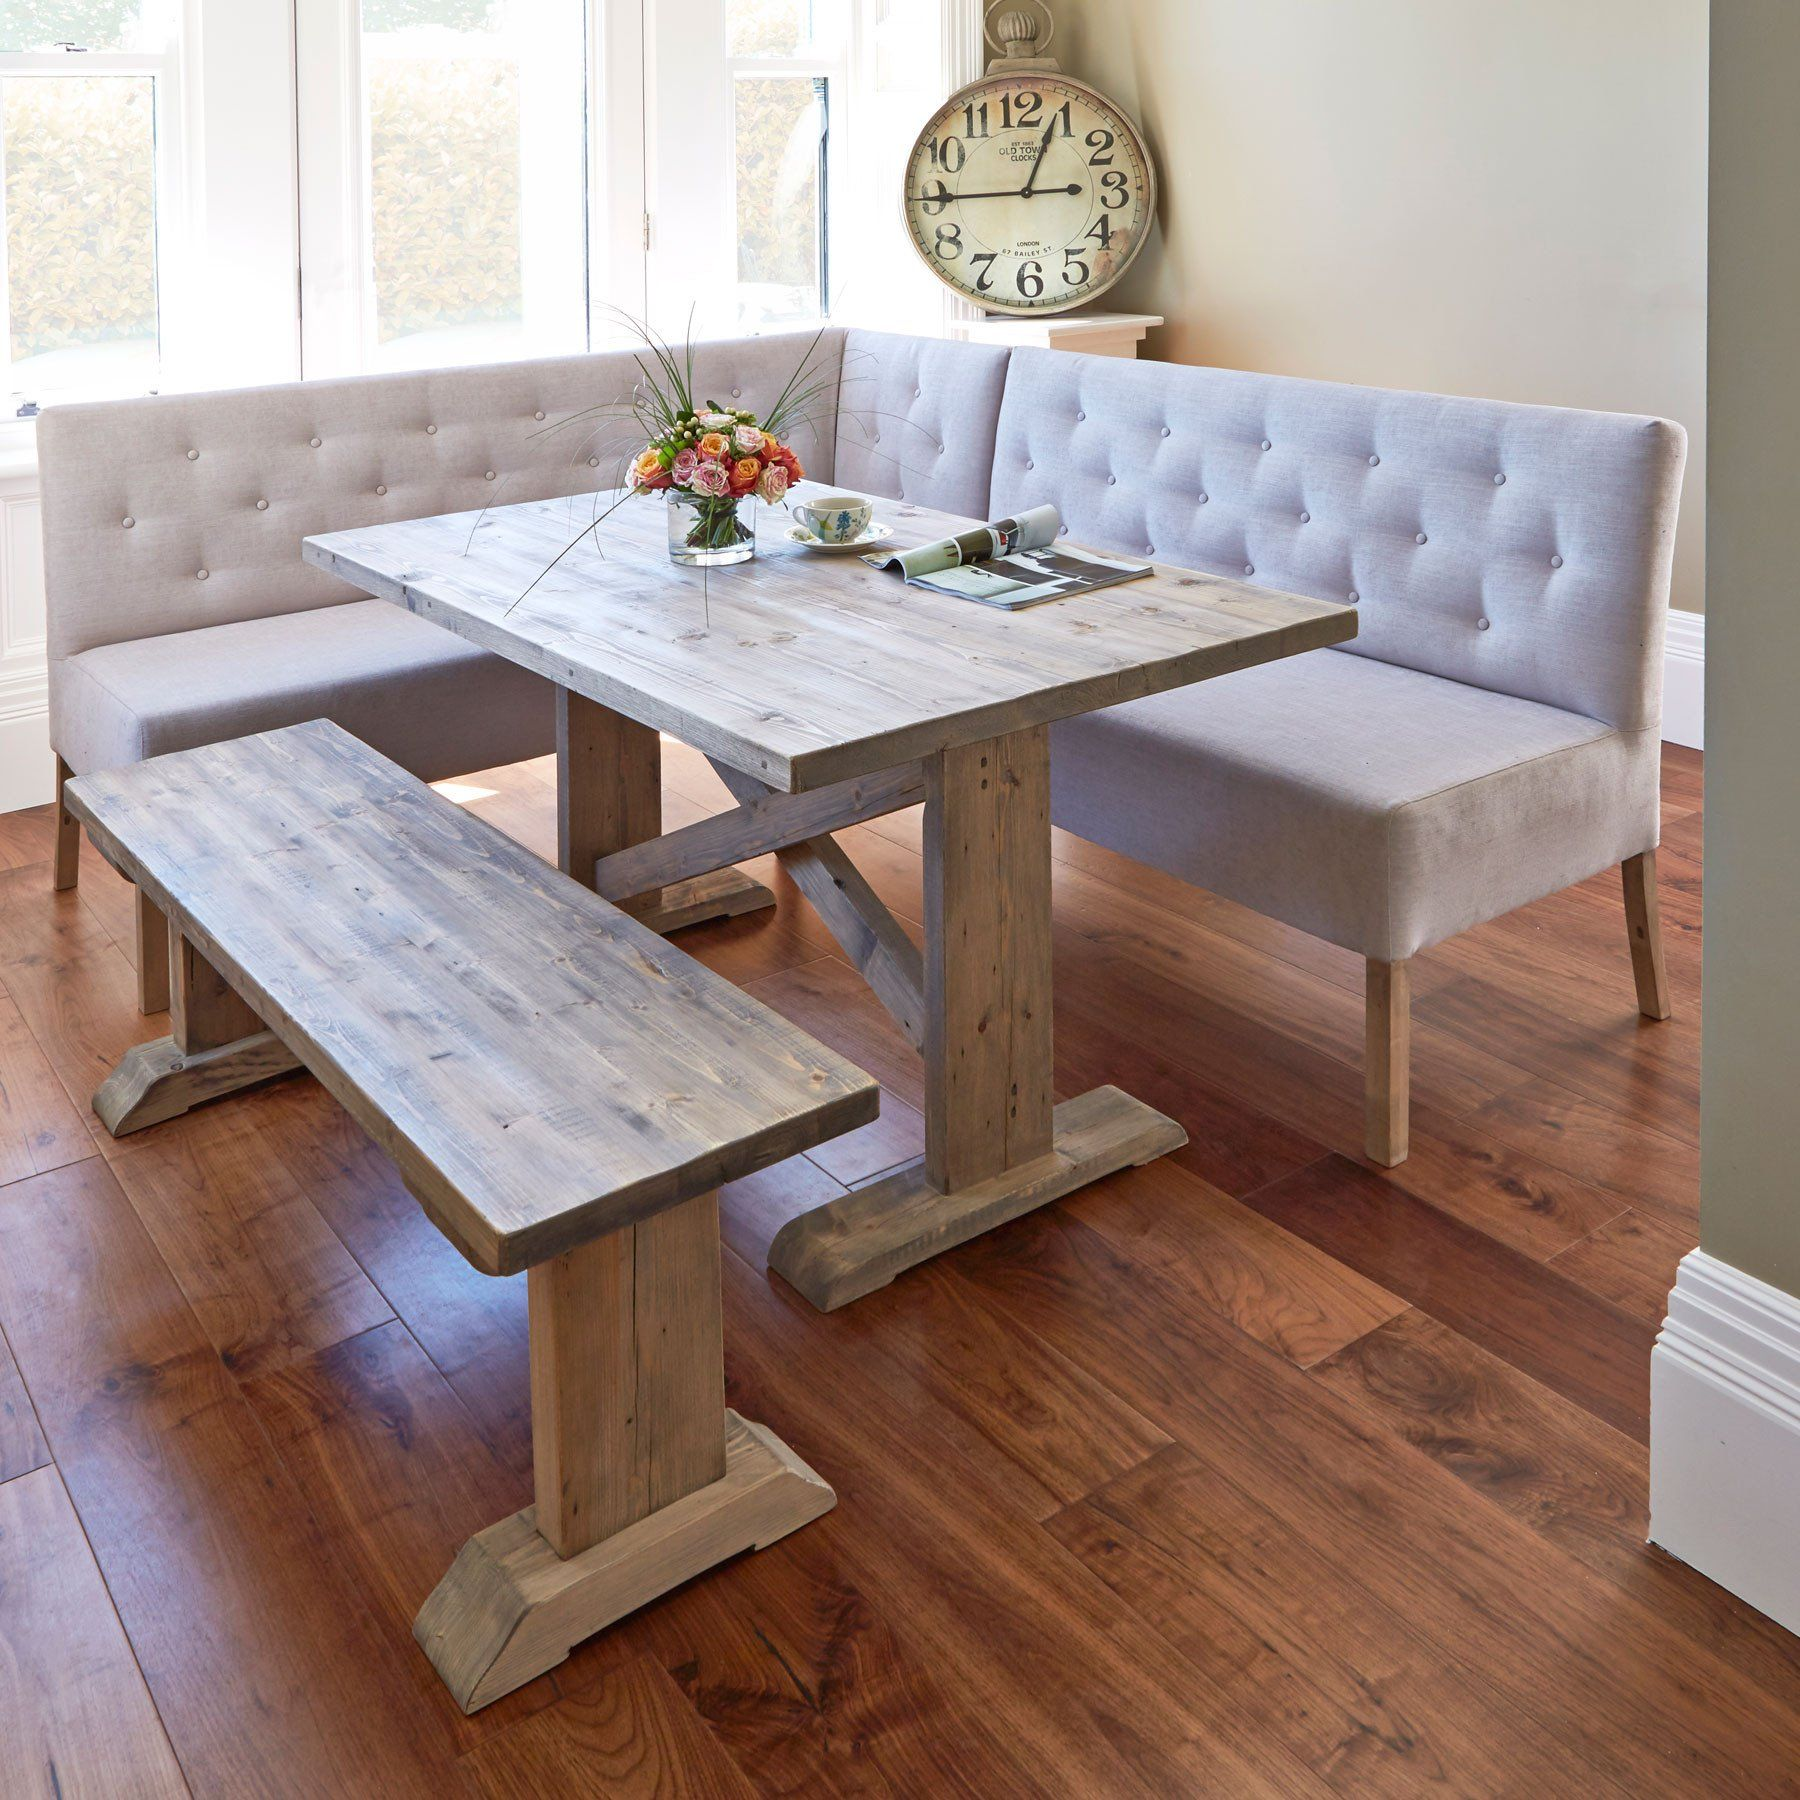 1515762650-booth-kitchen-table-round-kitchen-table-corner ...